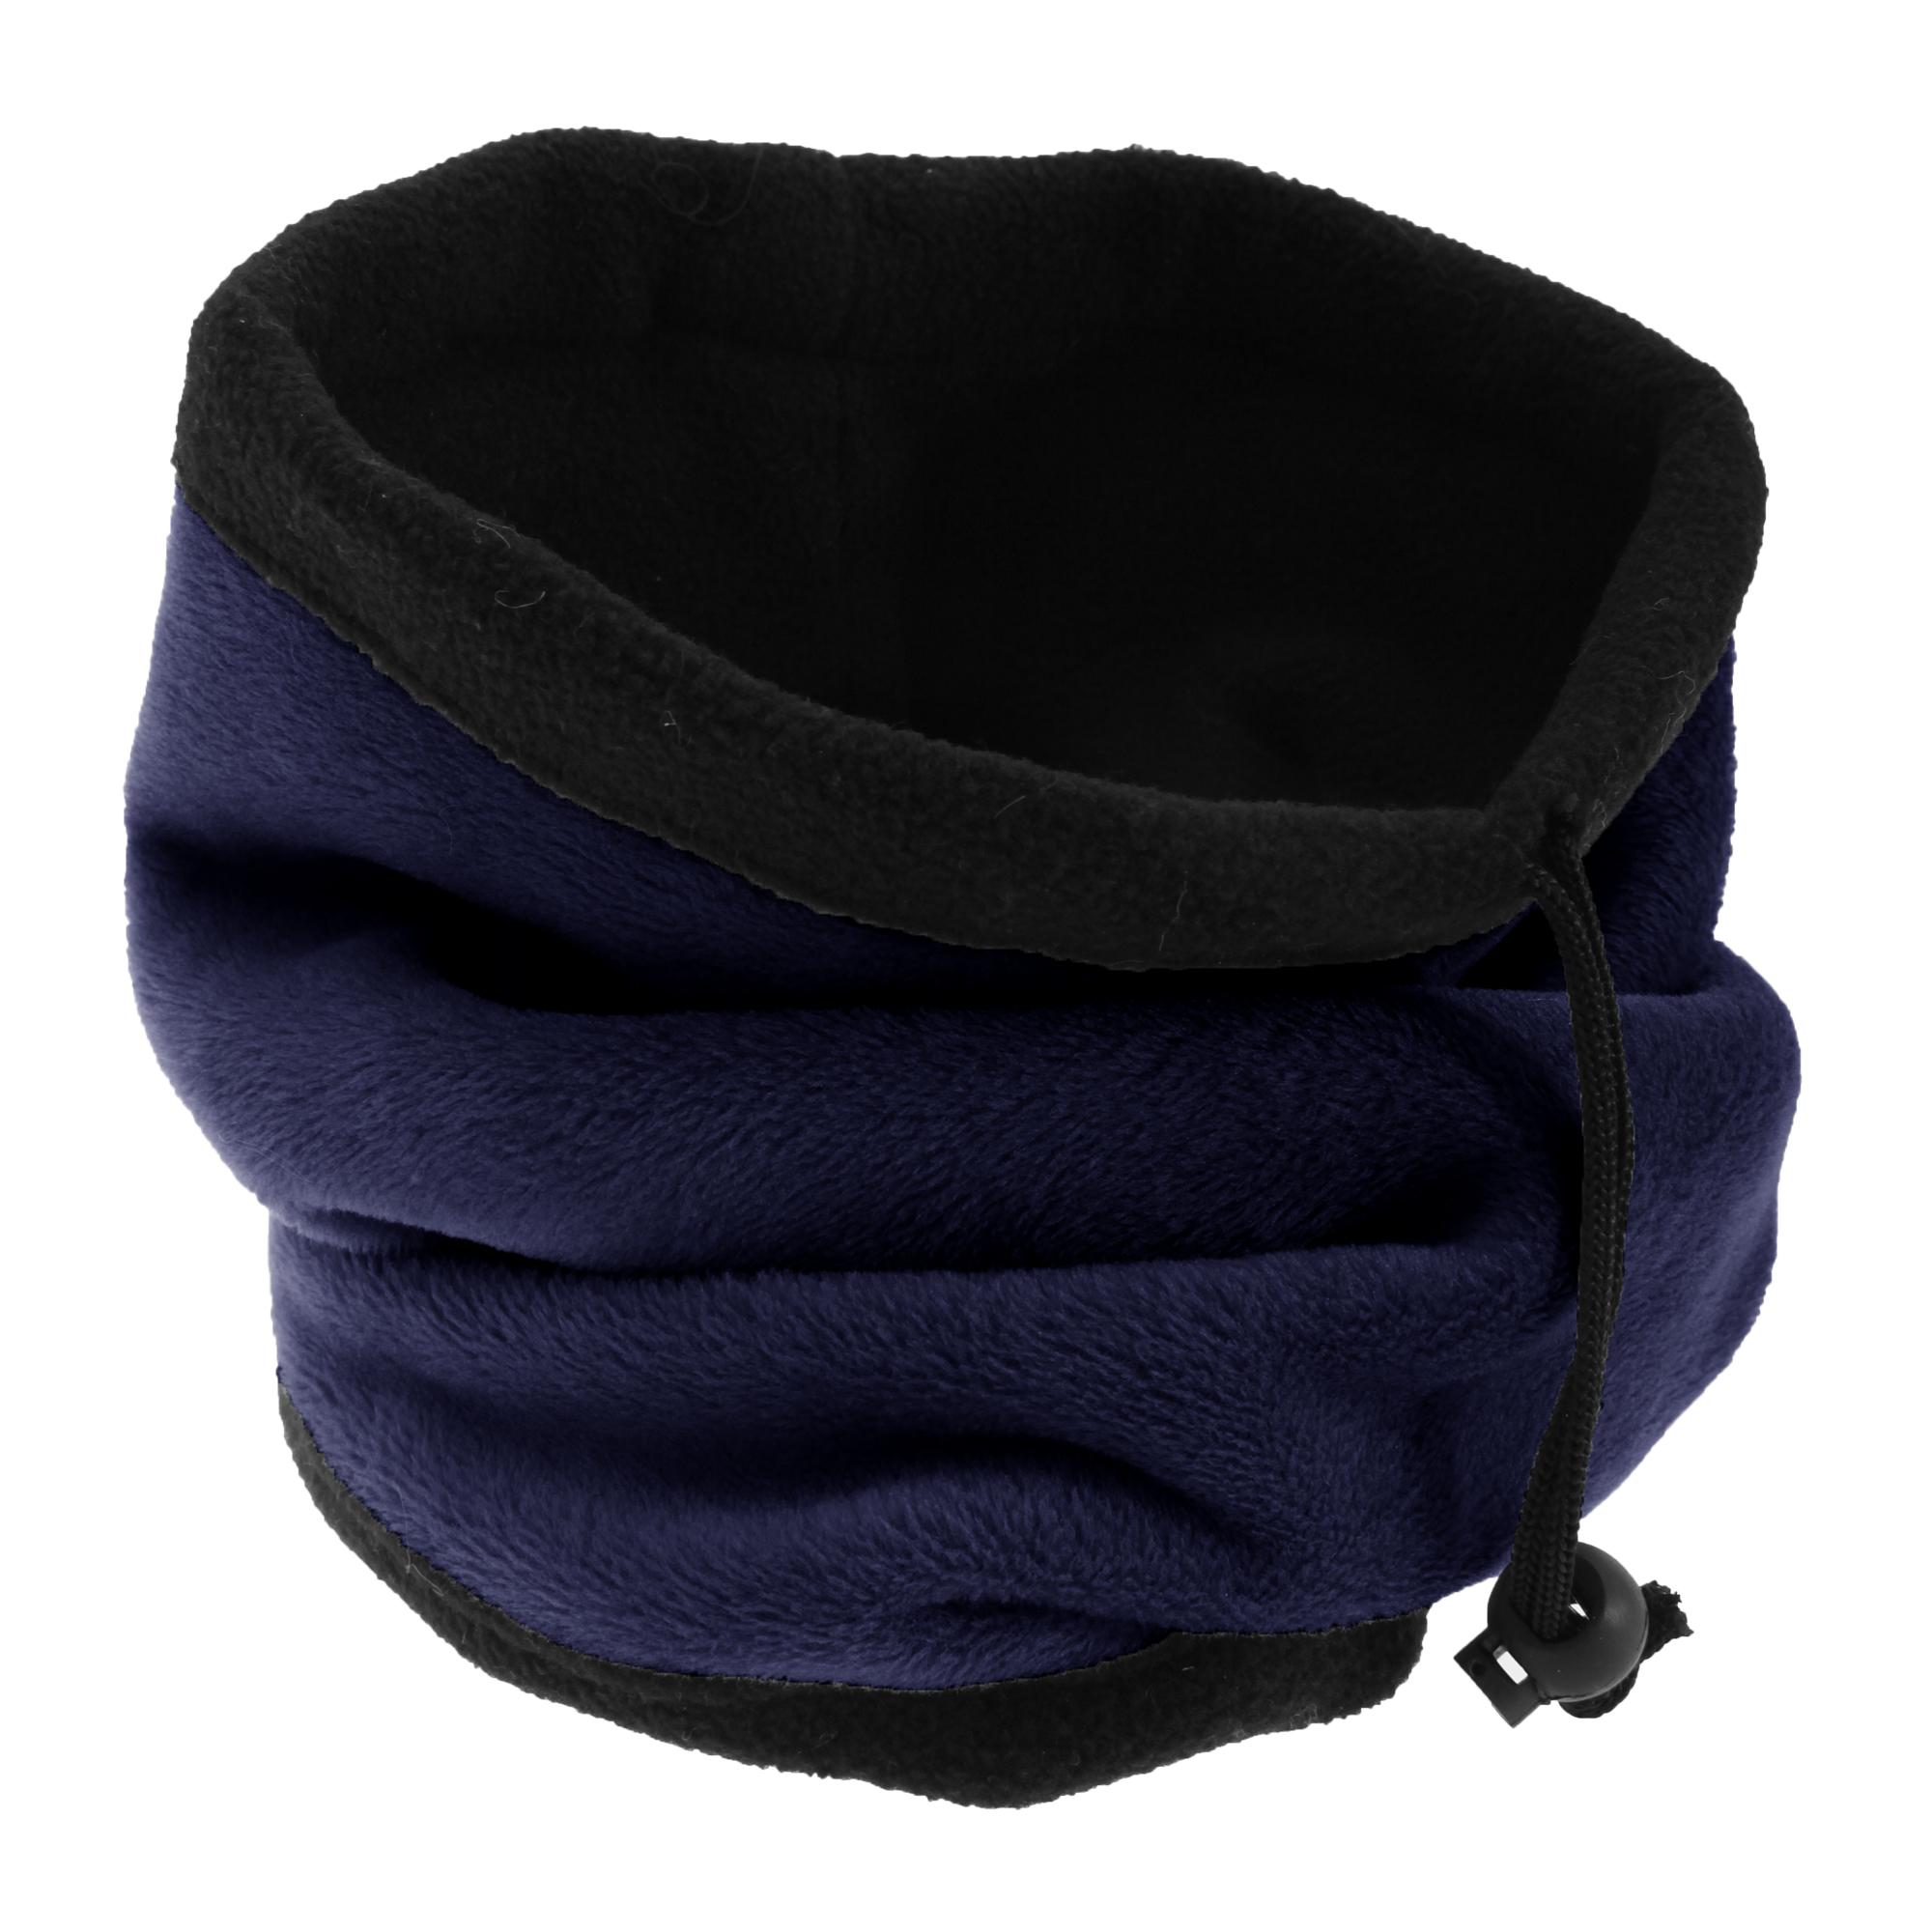 FLOSO Womens/Ladies Multipurpose Fleece Neckwarmer Snood / Hat (One Size) (Navy)